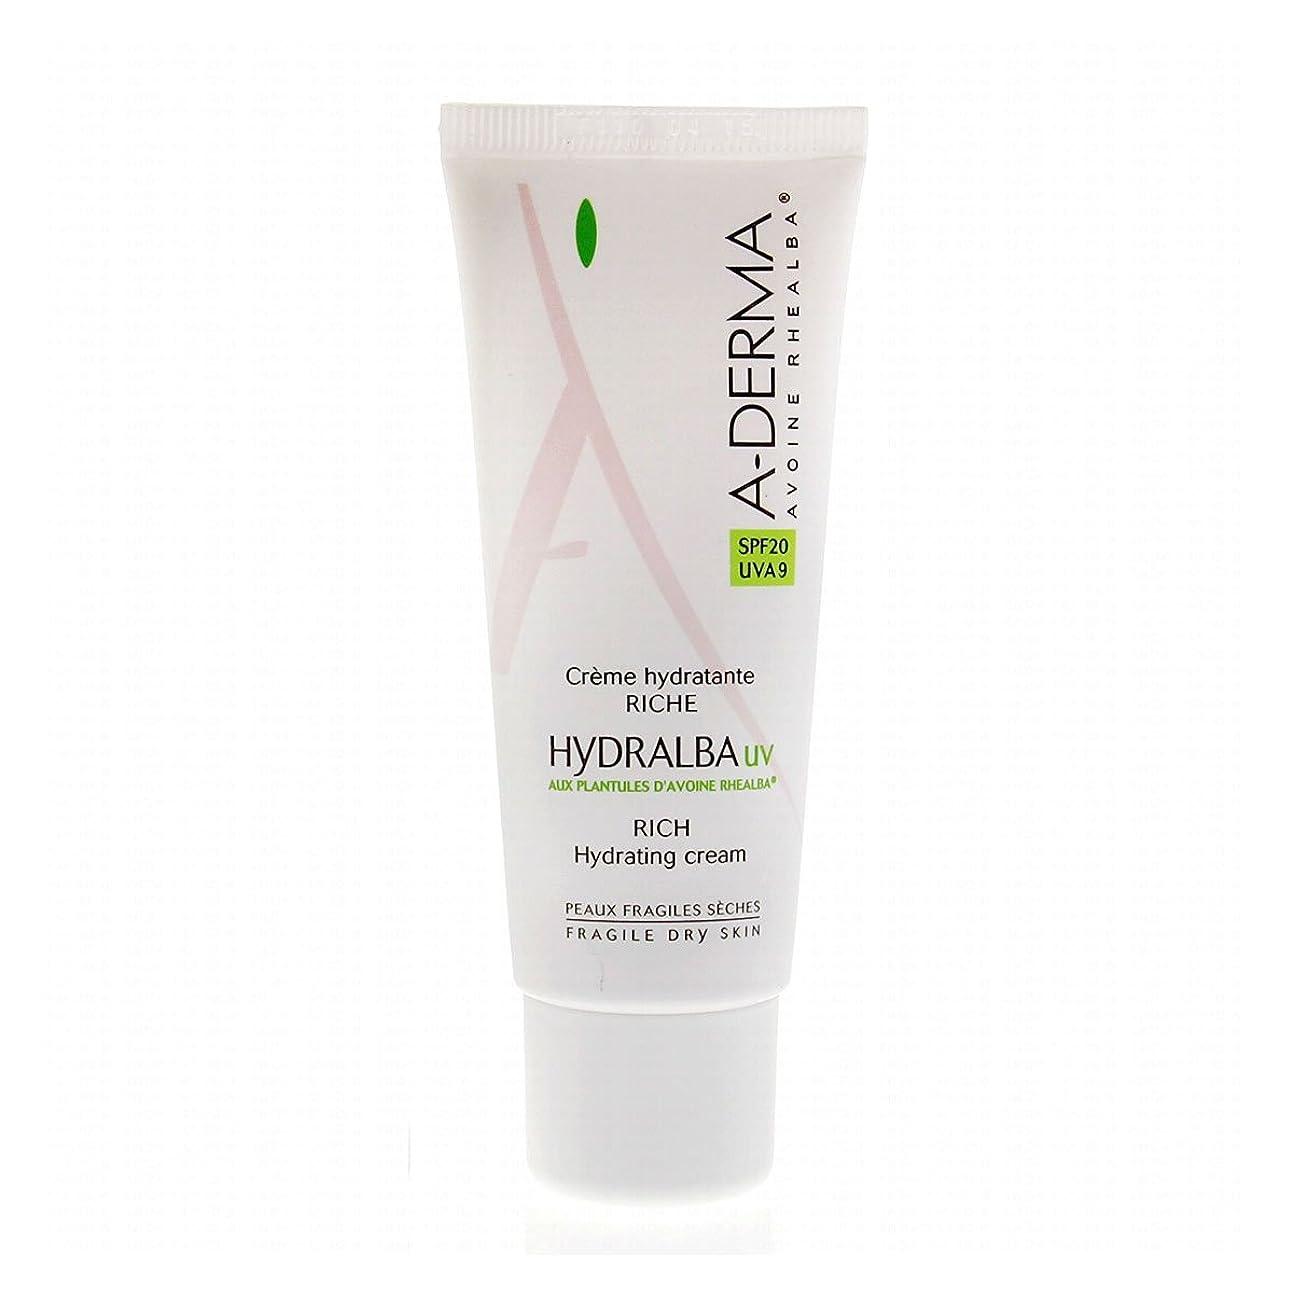 神民主主義魂A-derma Hydralba Uv Rich Hydrating Cream 40ml [並行輸入品]